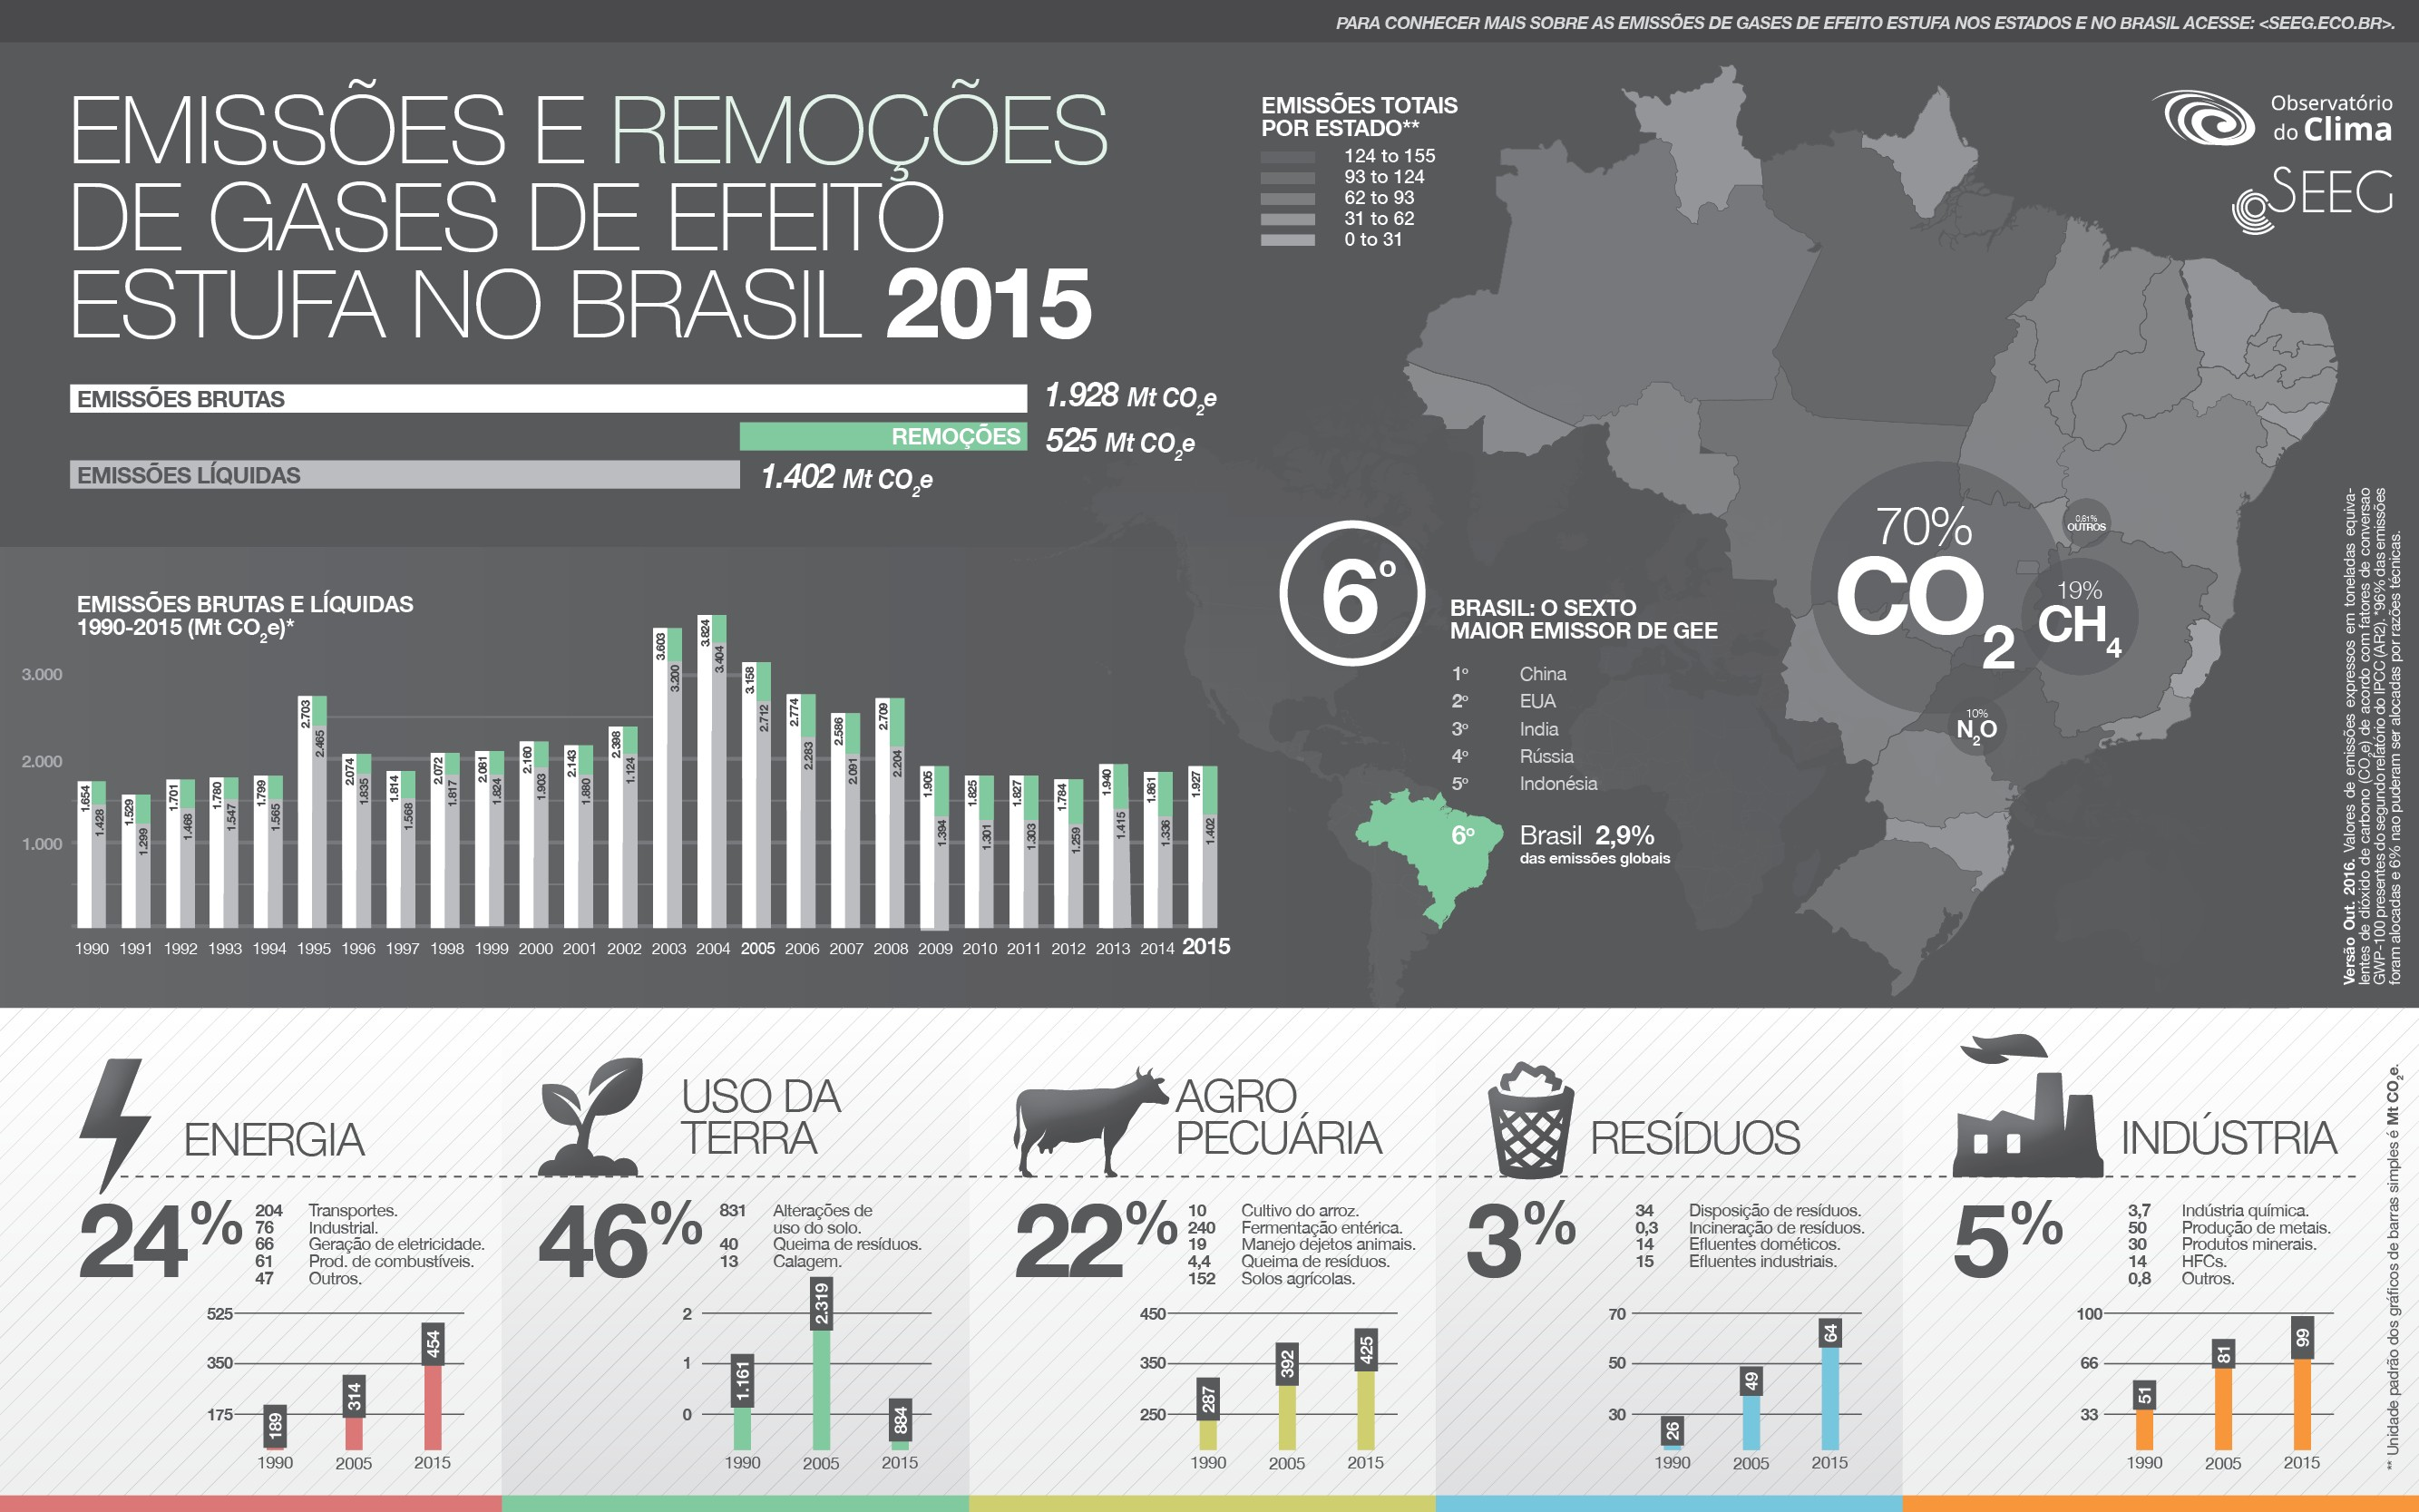 Imprimir Calendario De Mundial 2019 Recientes Mudan‡as Climticas E Energia